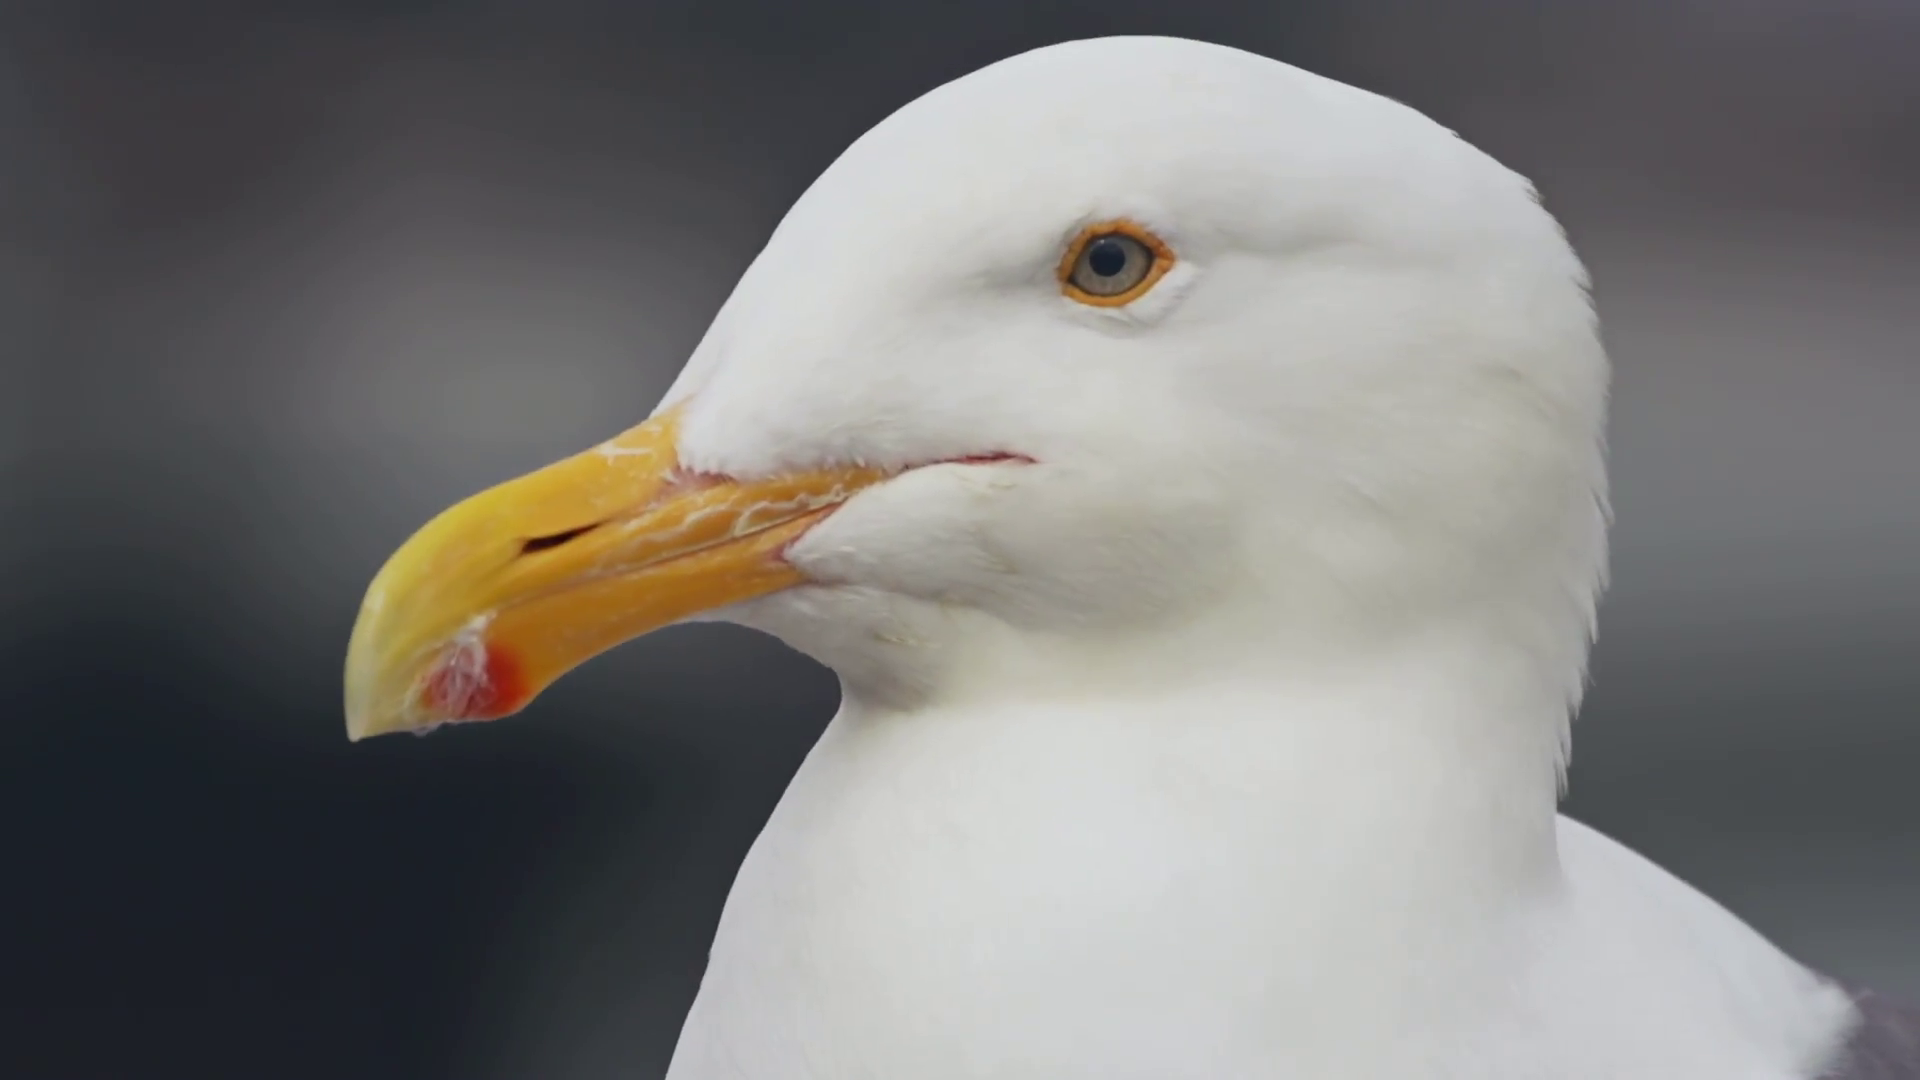 Seagull head photo